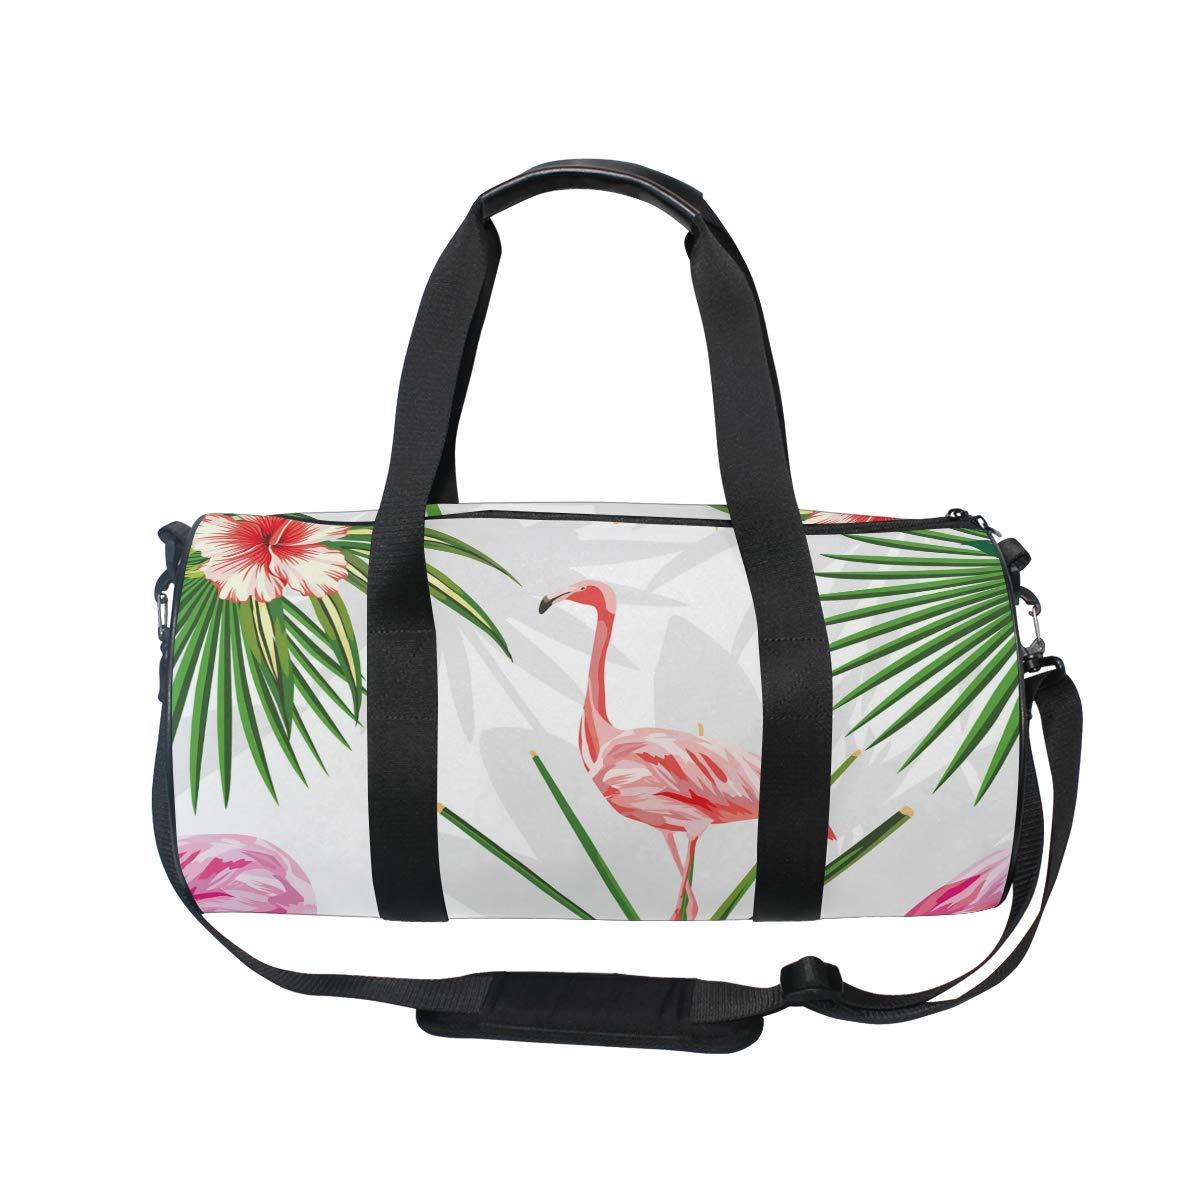 Flamingo Sports Gym Bag Travel Duffel Bag with Pockets Luggage & Travel Gear Shoulder Strap Fitness Bag by EVERUI (Image #2)